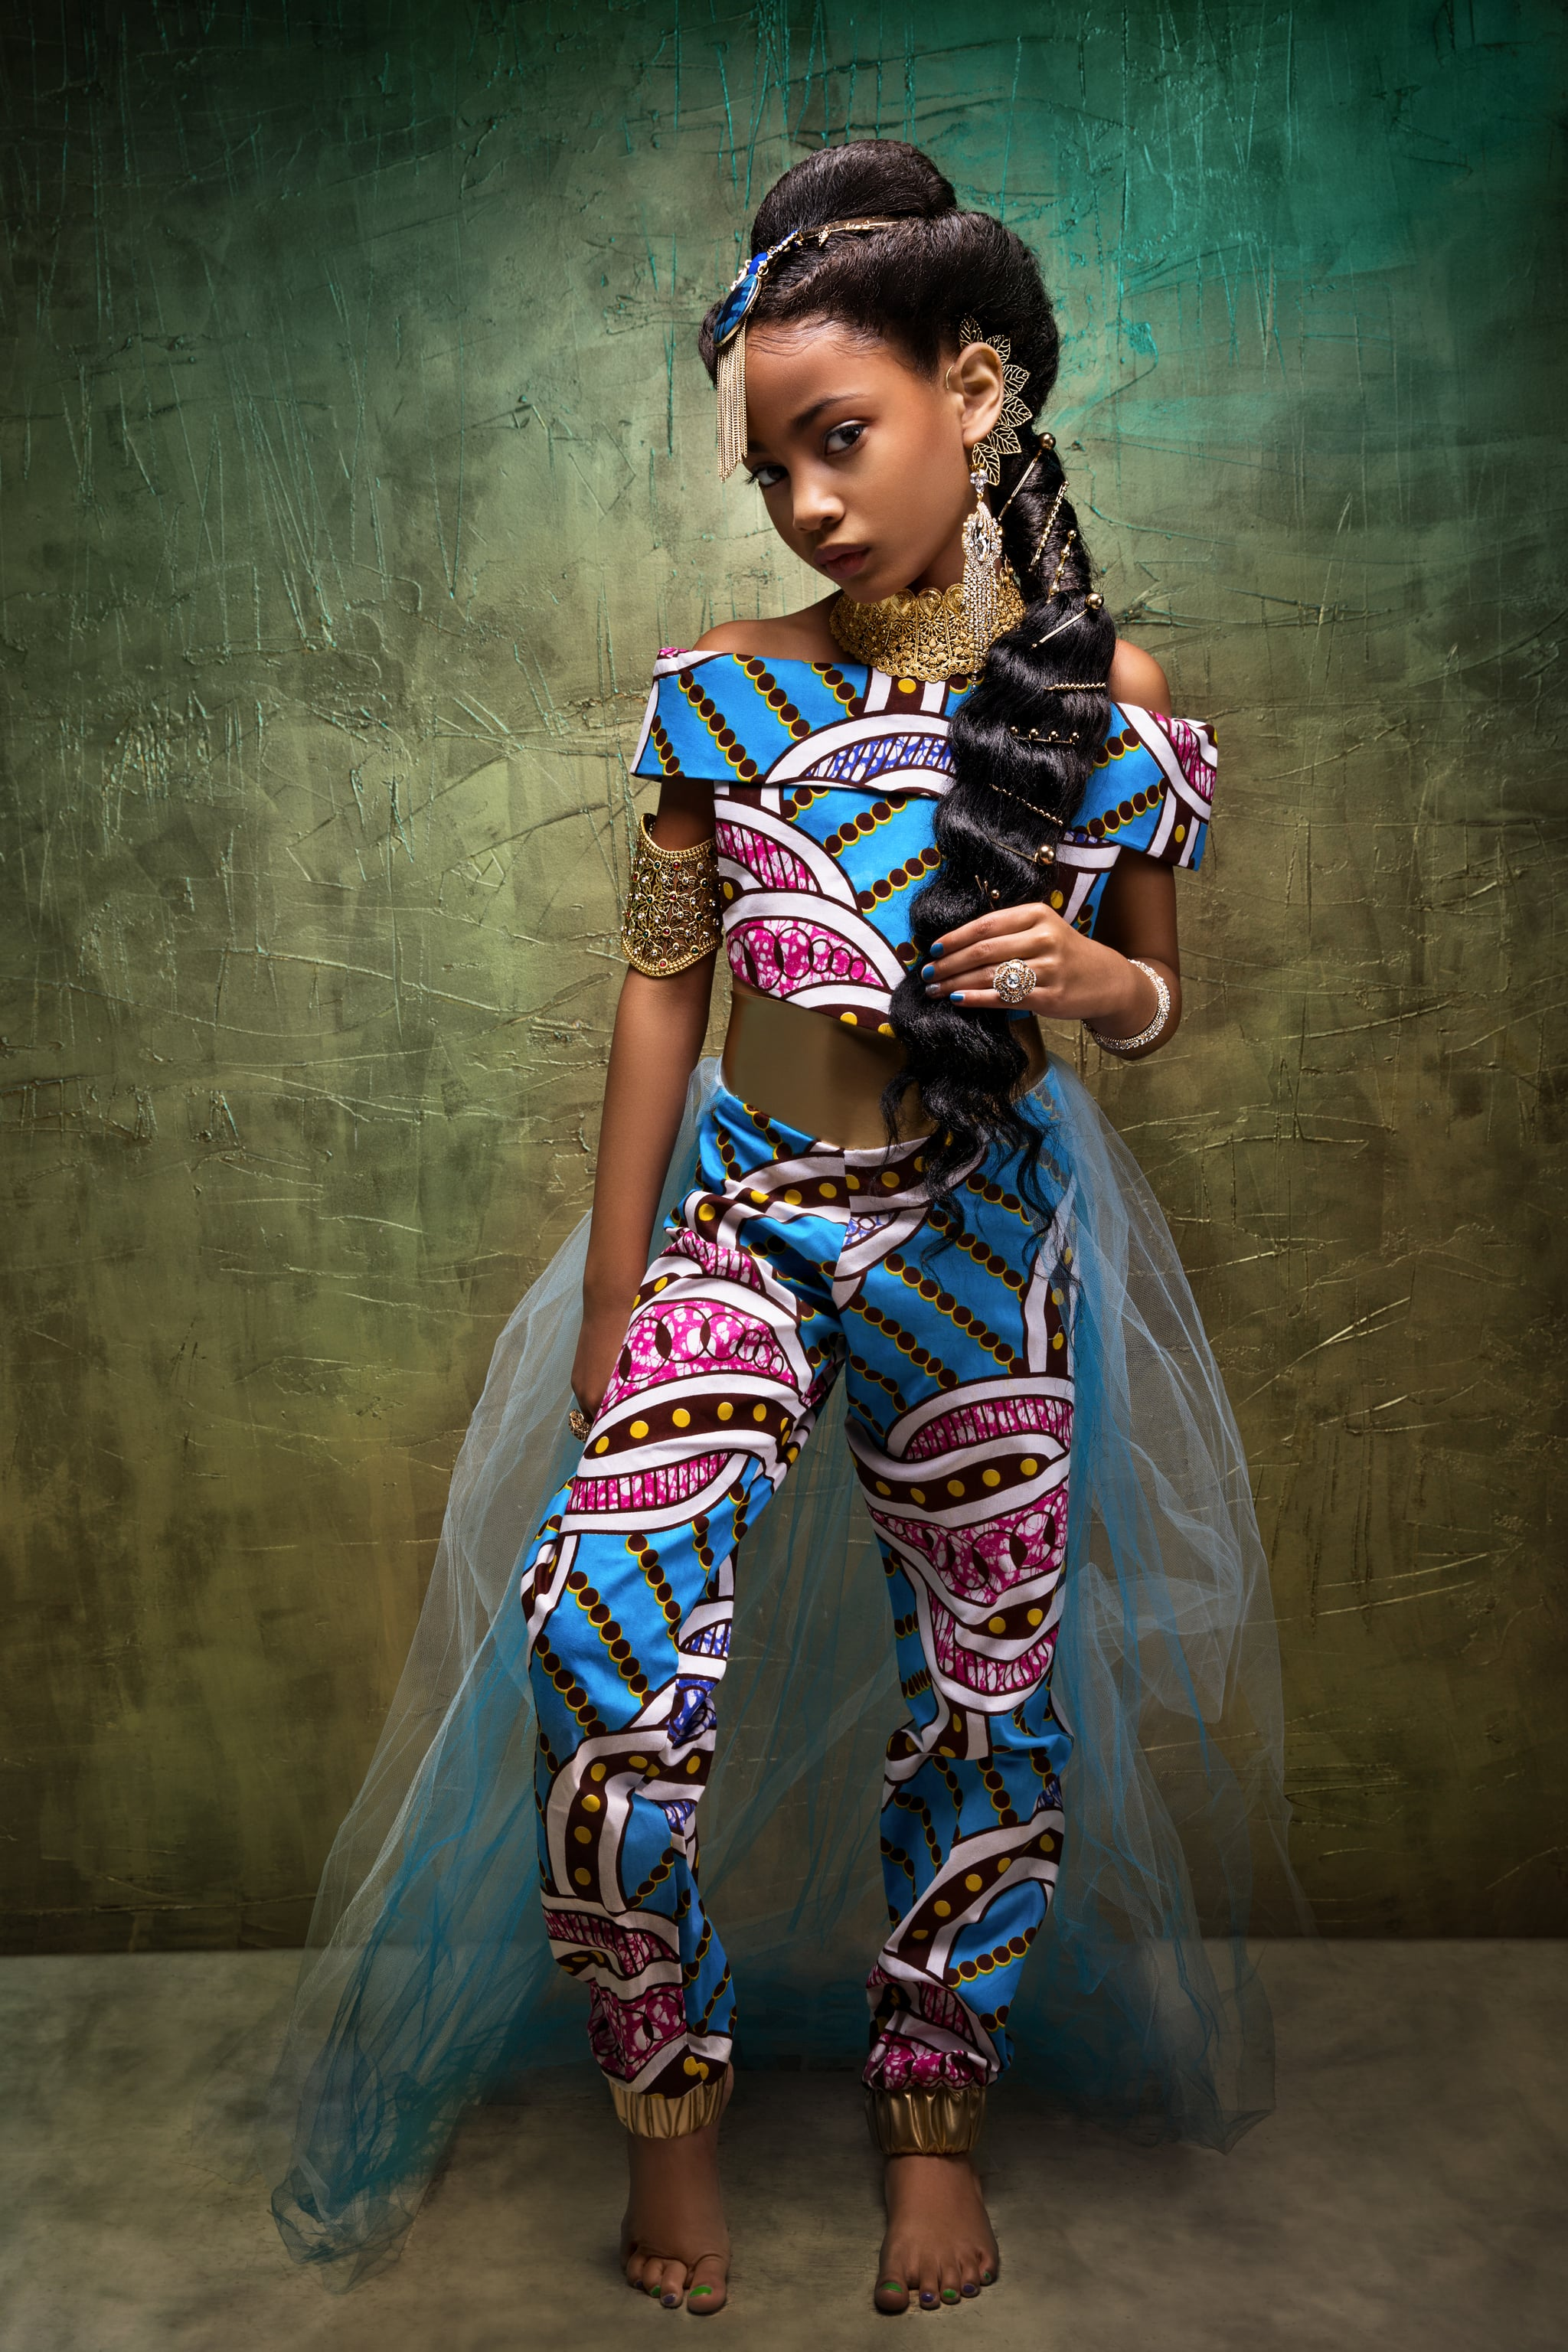 Black girl barefoot Photo Shoot Features Black Girls As Disney Princesses Popsugar Family